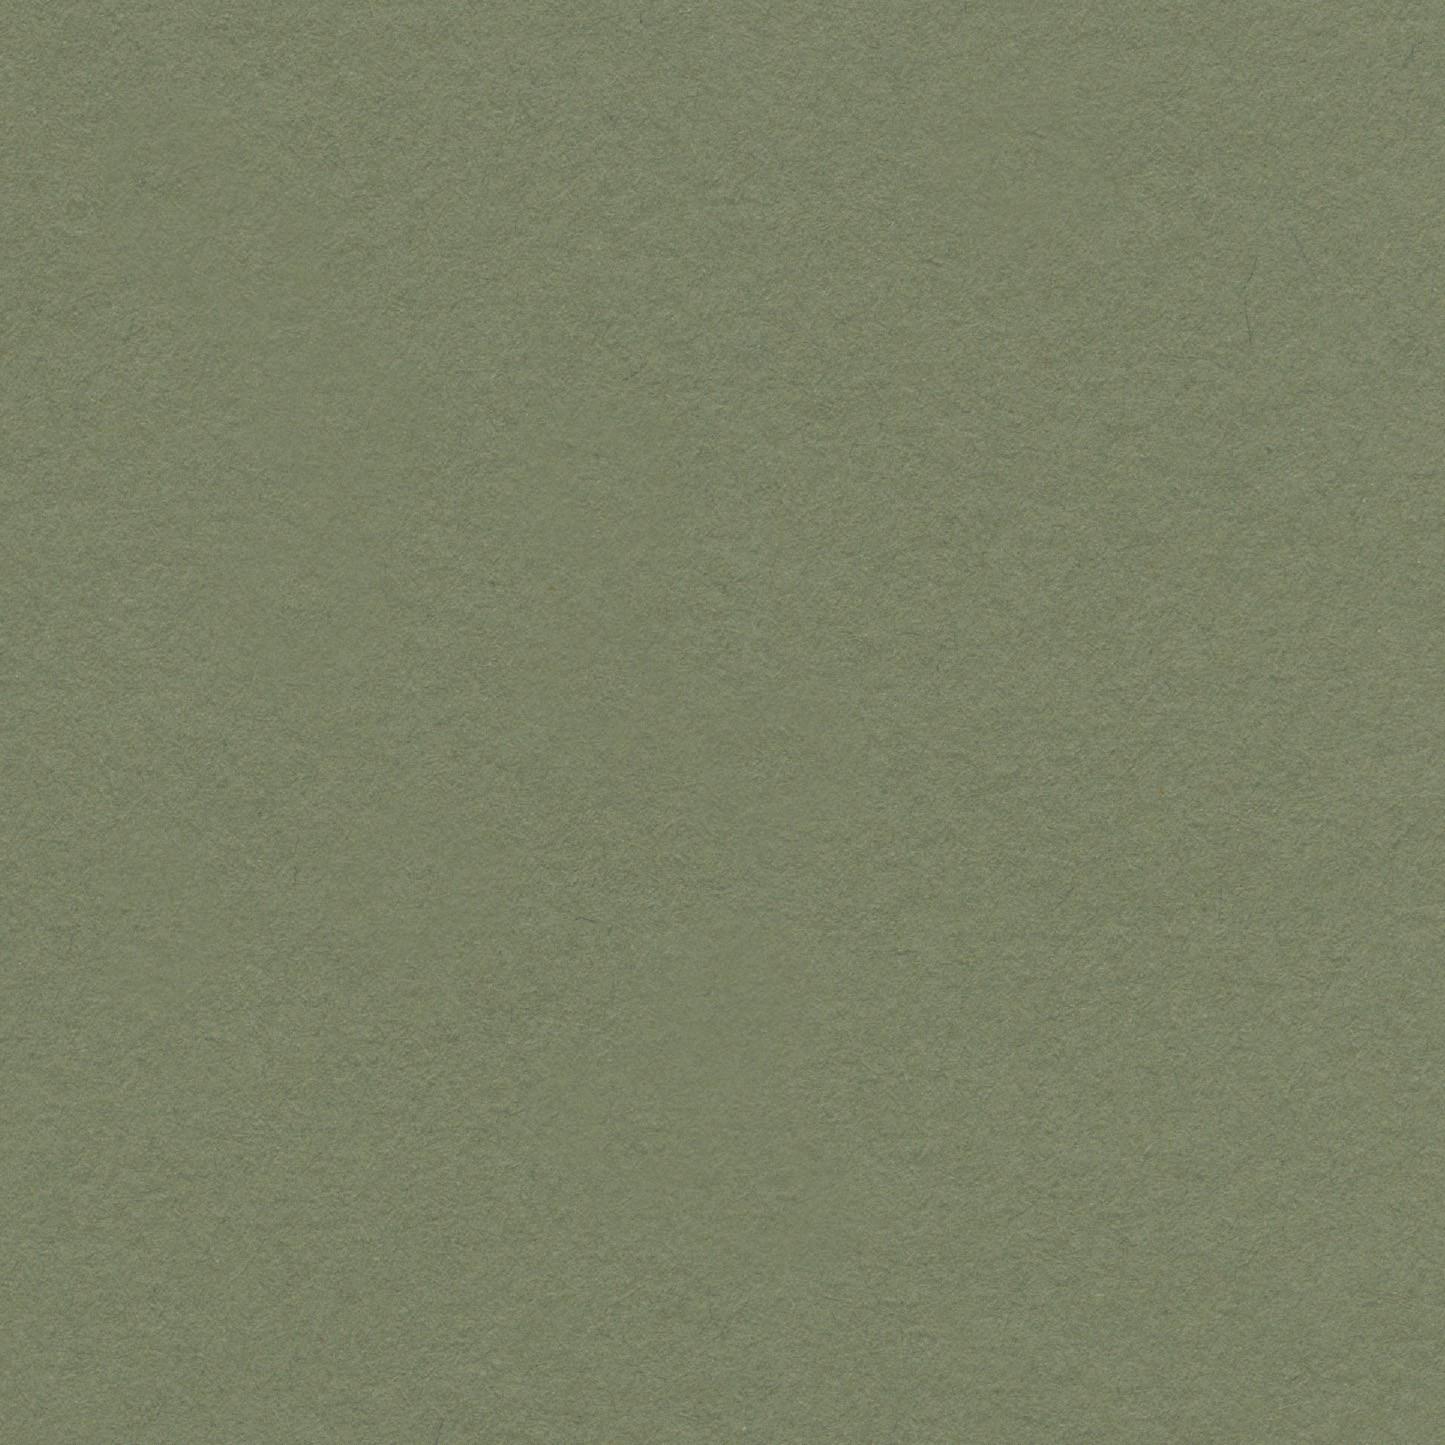 Green - Olive 135gsm